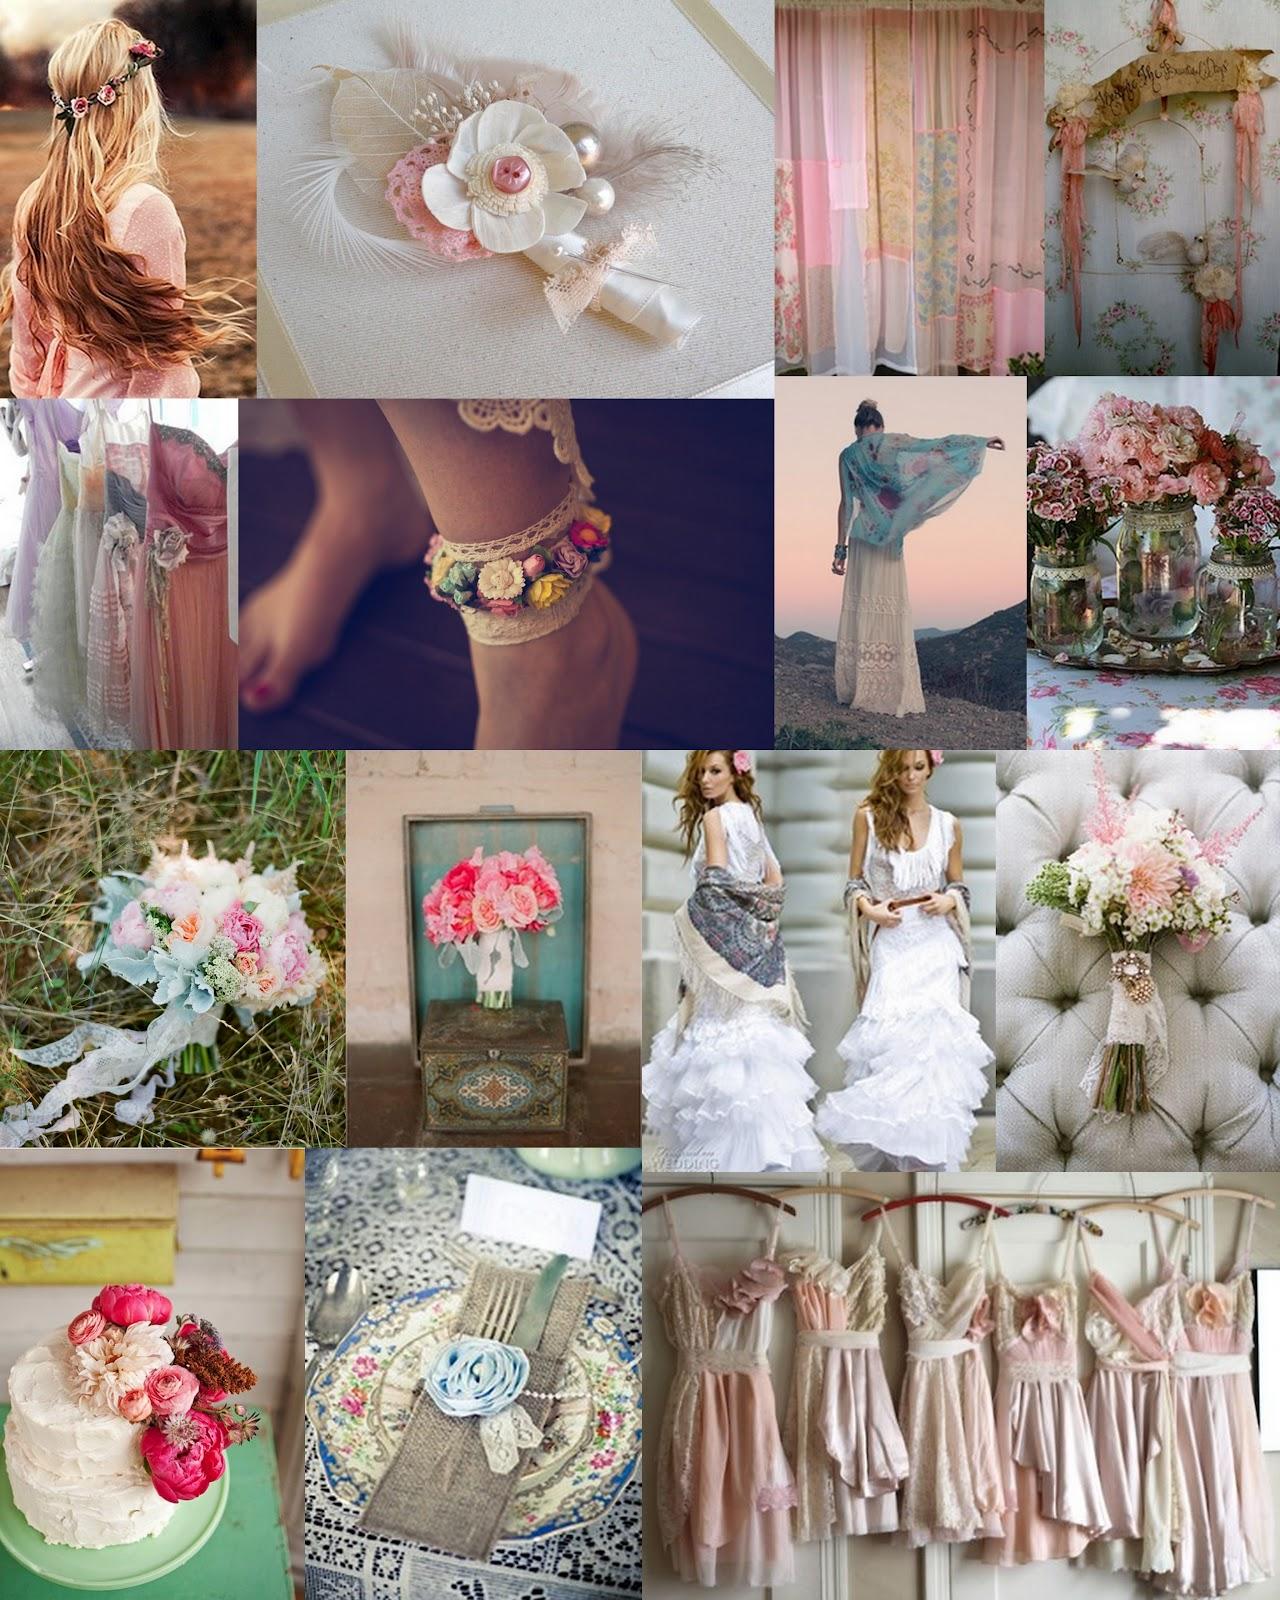 A Romantic Vintage Wedding Ideas For Weddings: GYPSY YAYA: Bohemian /Romantic/ Vintage Wedding Mood Board